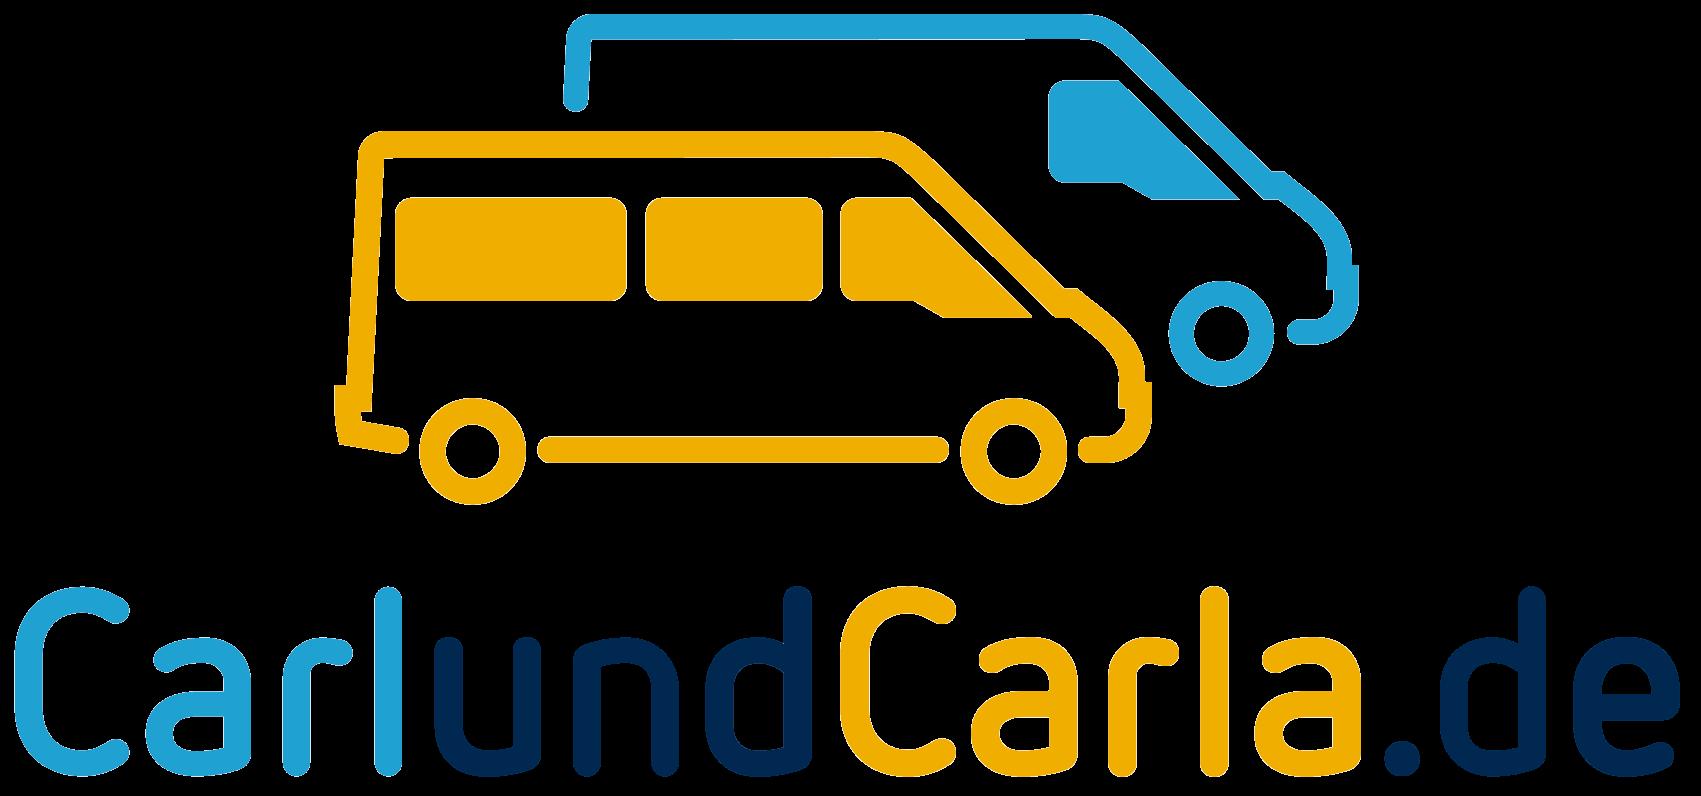 CarlundCarla.de_Logo_transparent_heller Hintergrund